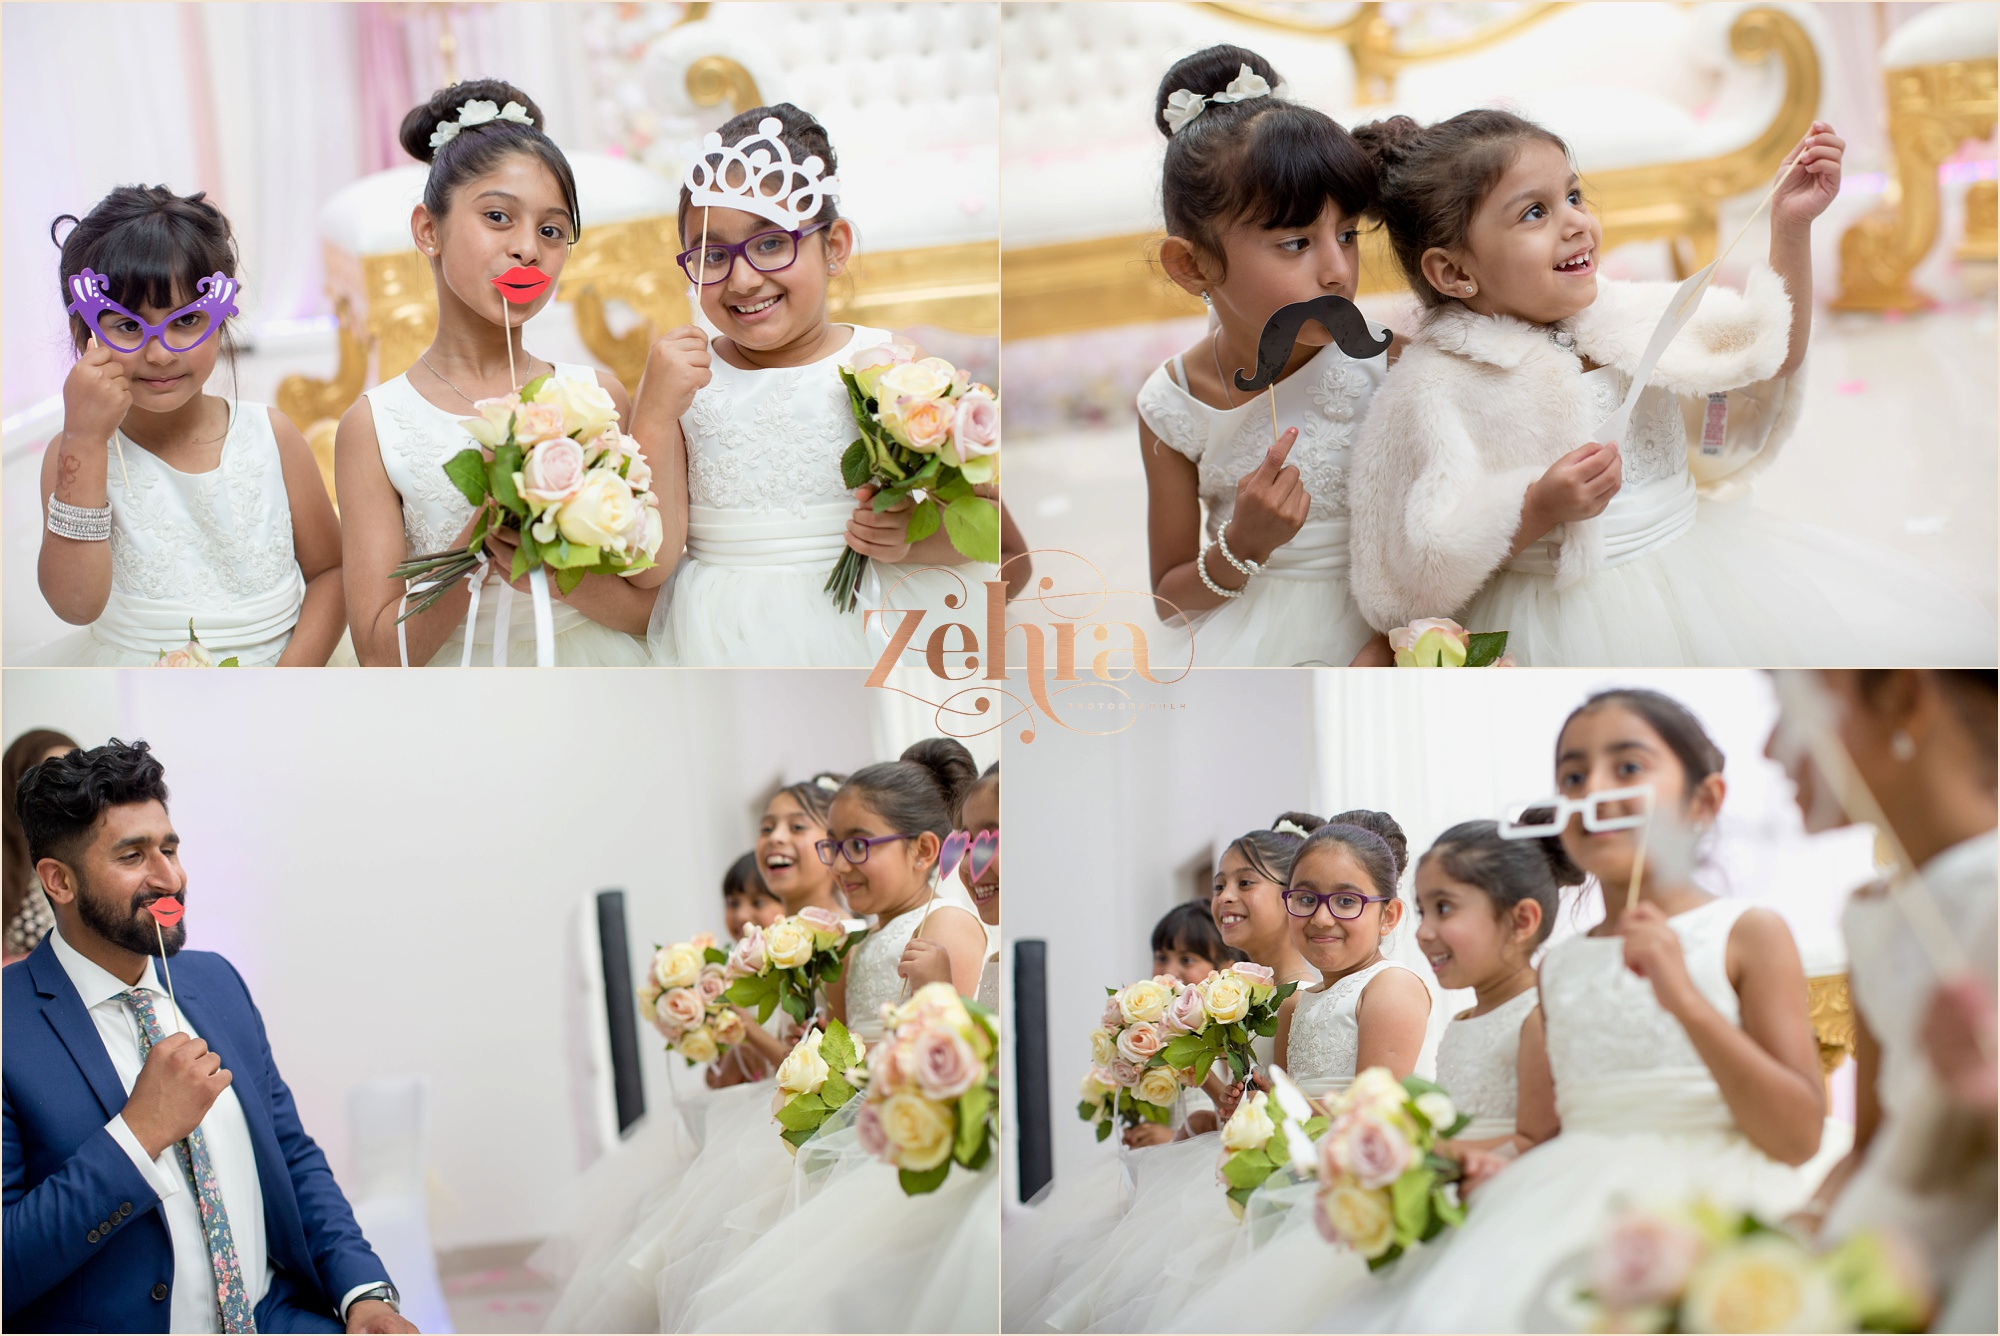 jasira manchester wedding photographer_0037.jpg